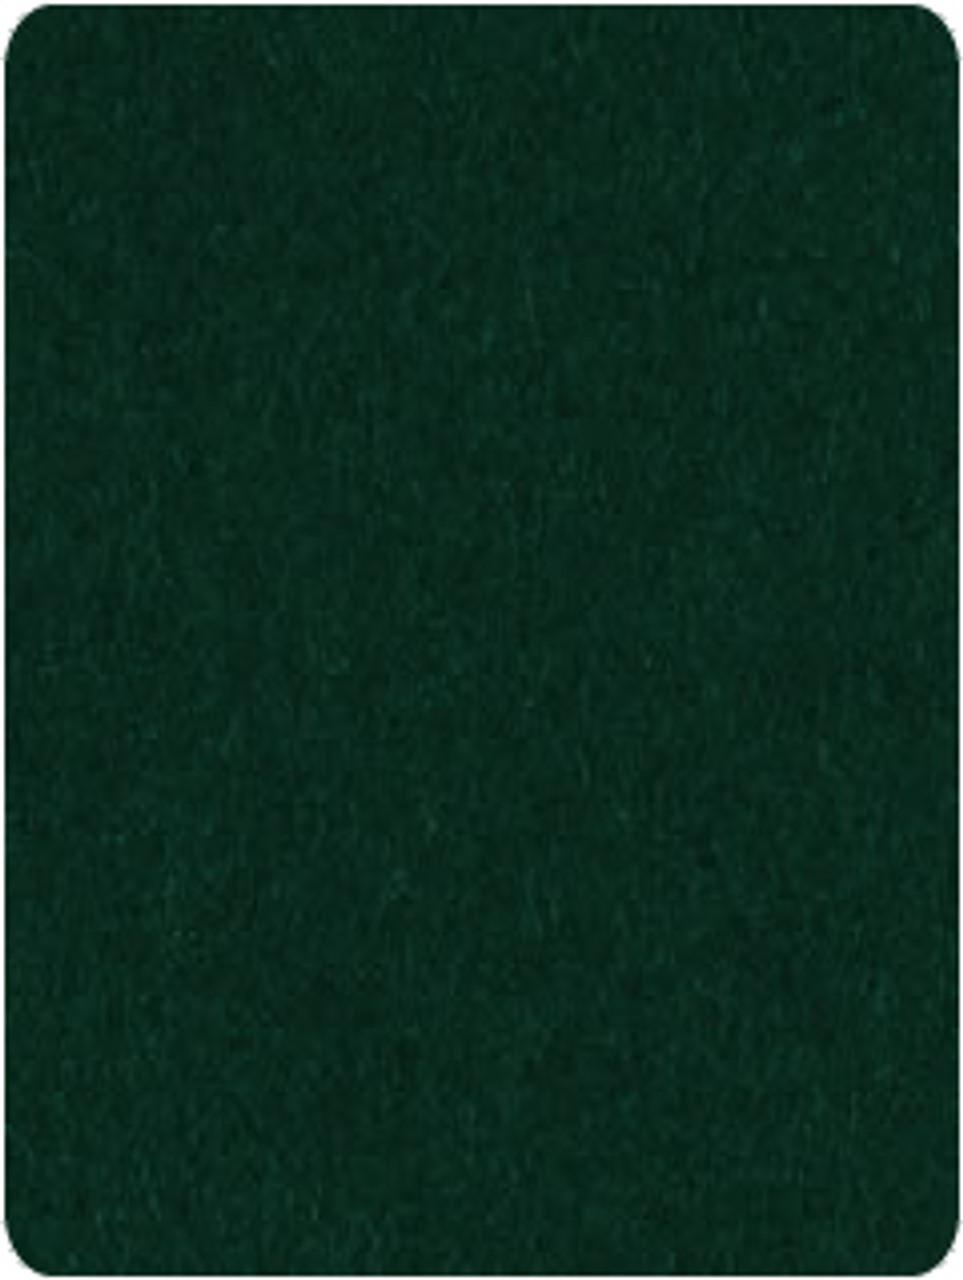 Invitational 8' Oversized Dark Green Table Felt